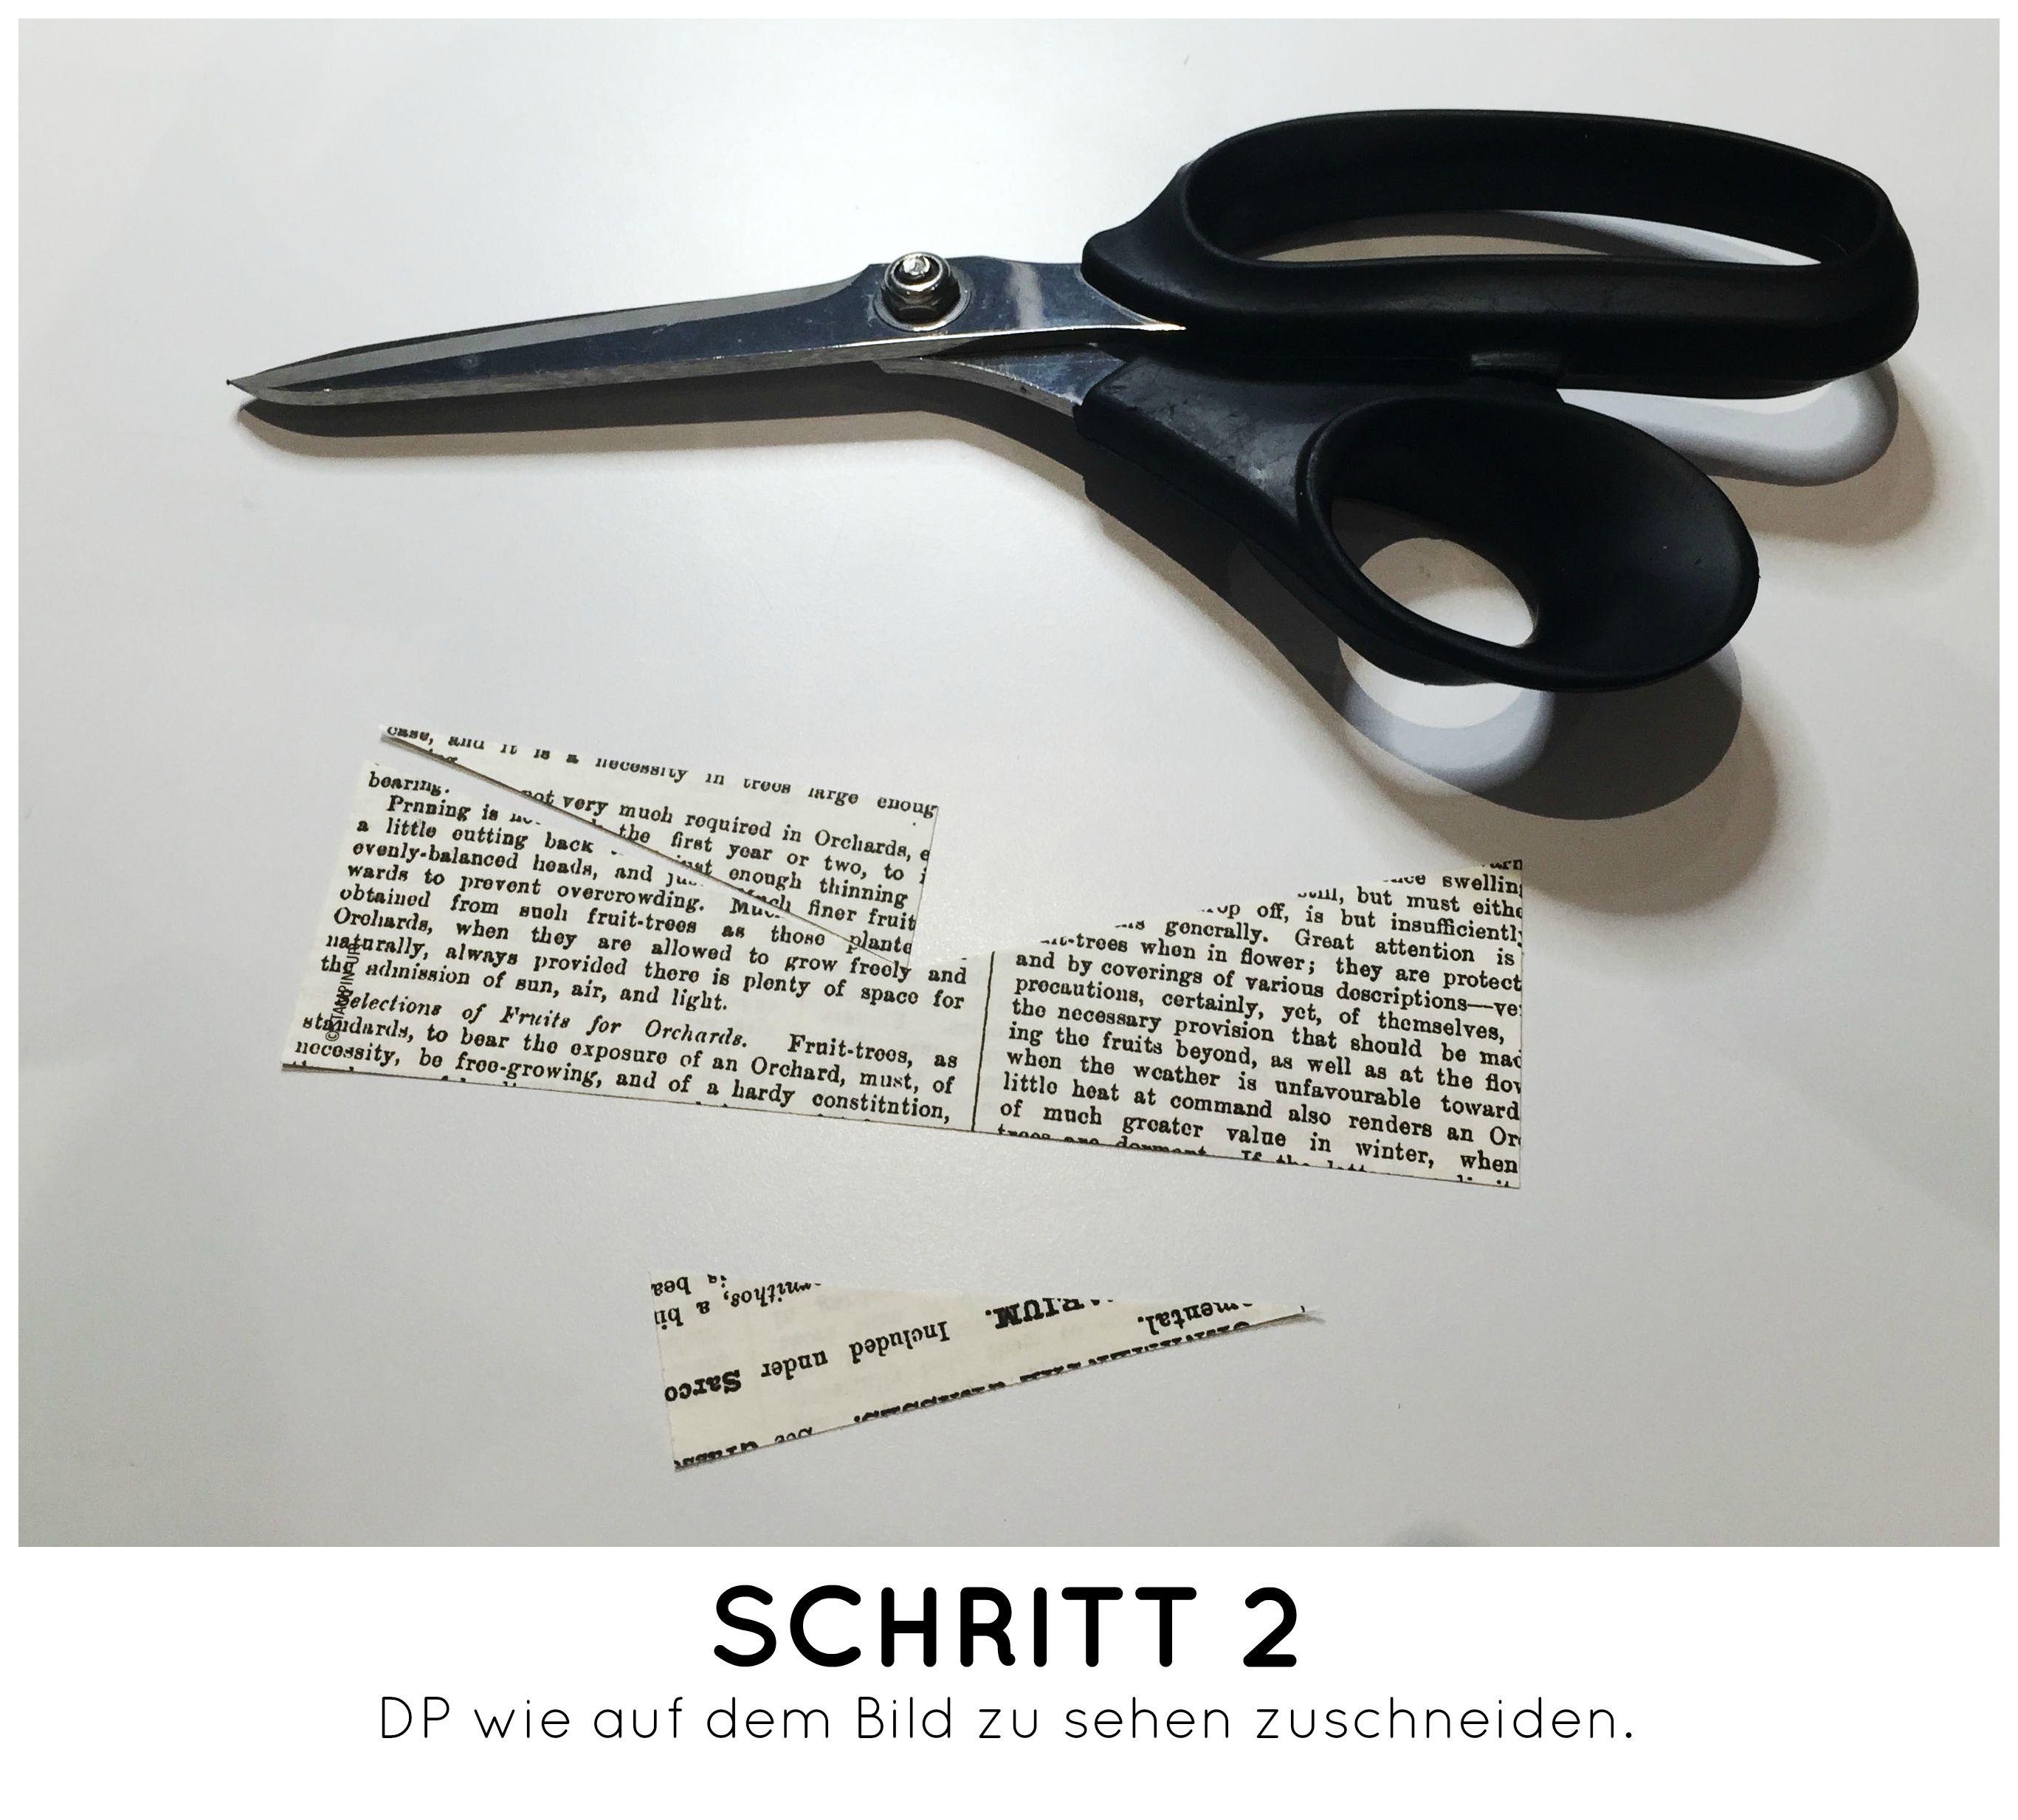 Stampin Up-Stempelherz-Dankeskarte-Zeig es am Montag Karte Danke Anleitung - Schritt 02